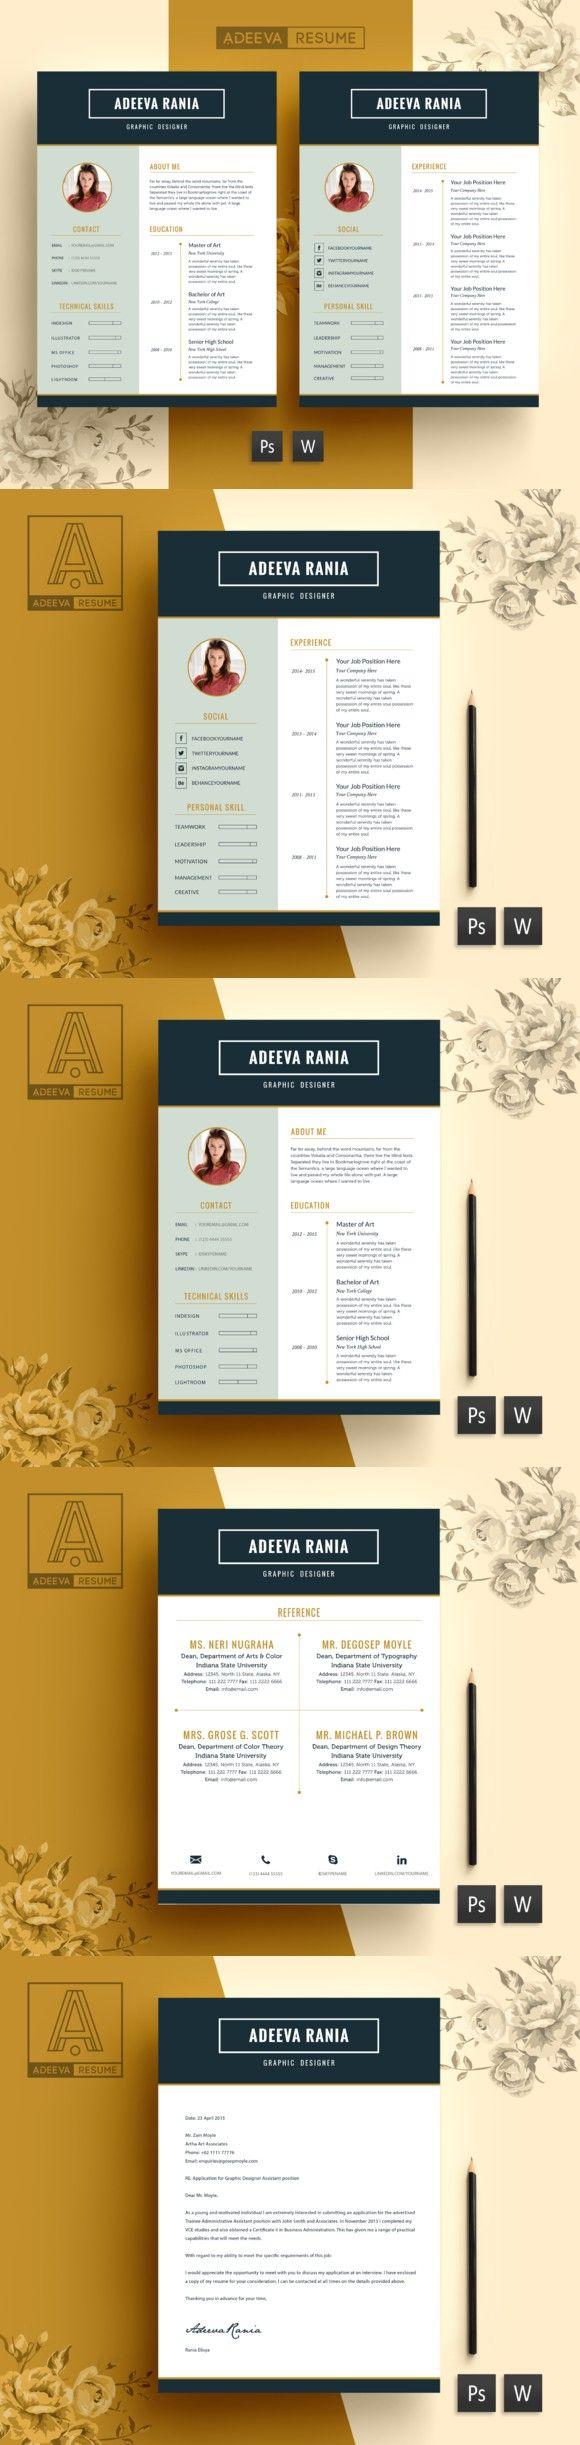 Professional Resume Template Rania Resume Templates 600